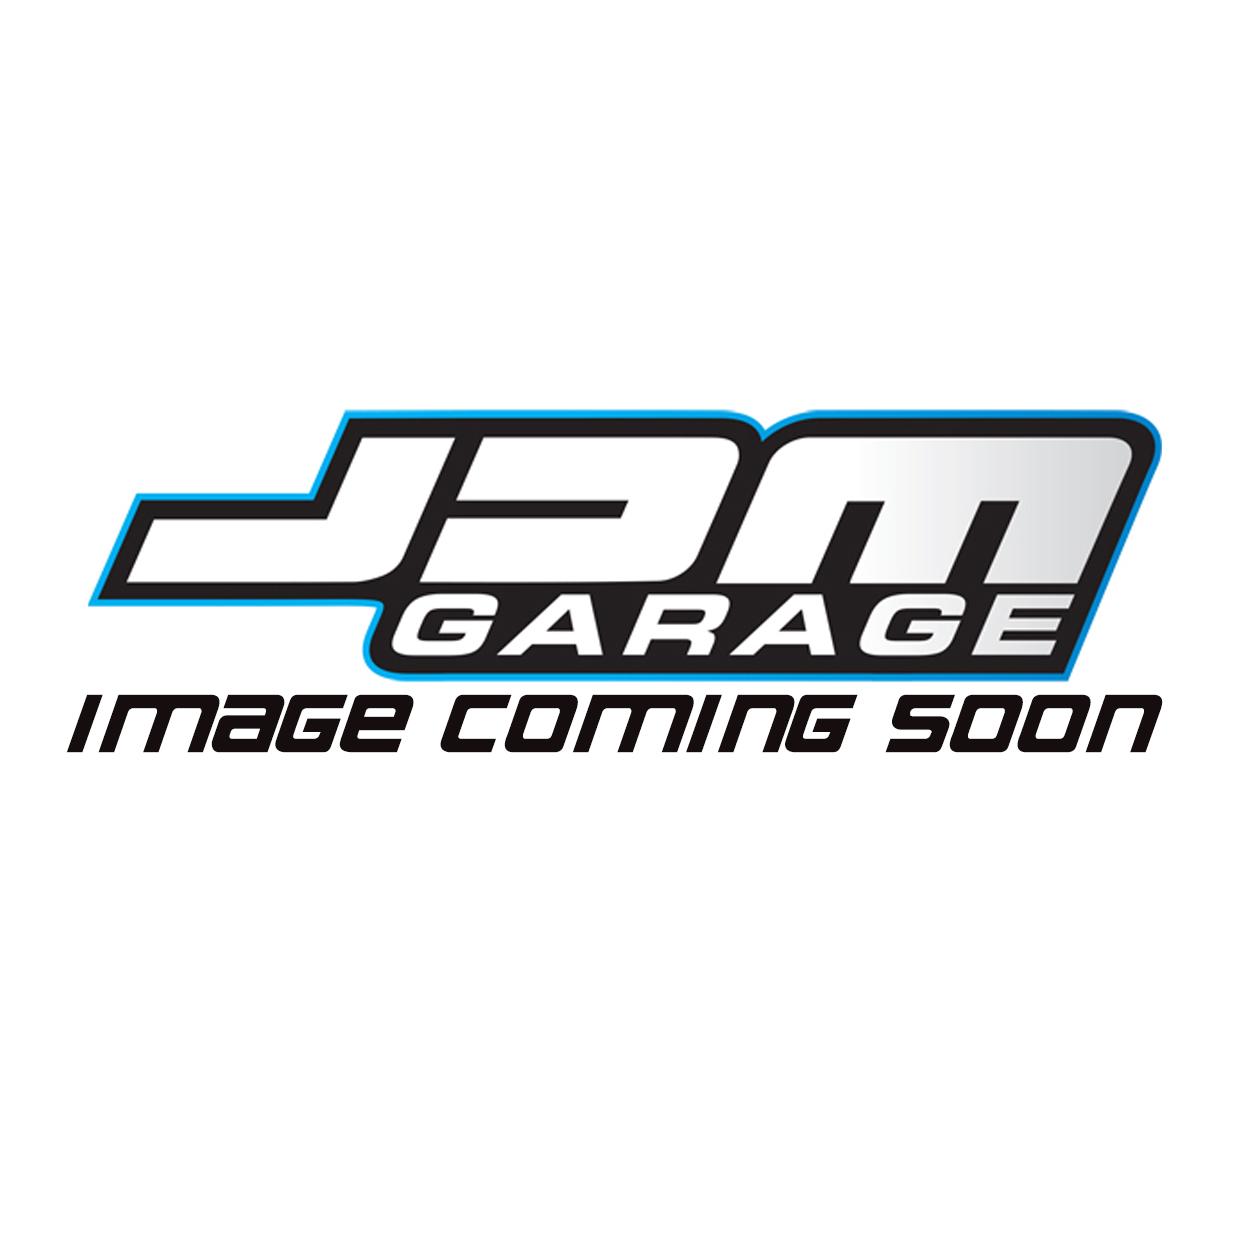 Garage Whifbitz Nissan R35 GTR Intercooler Kit